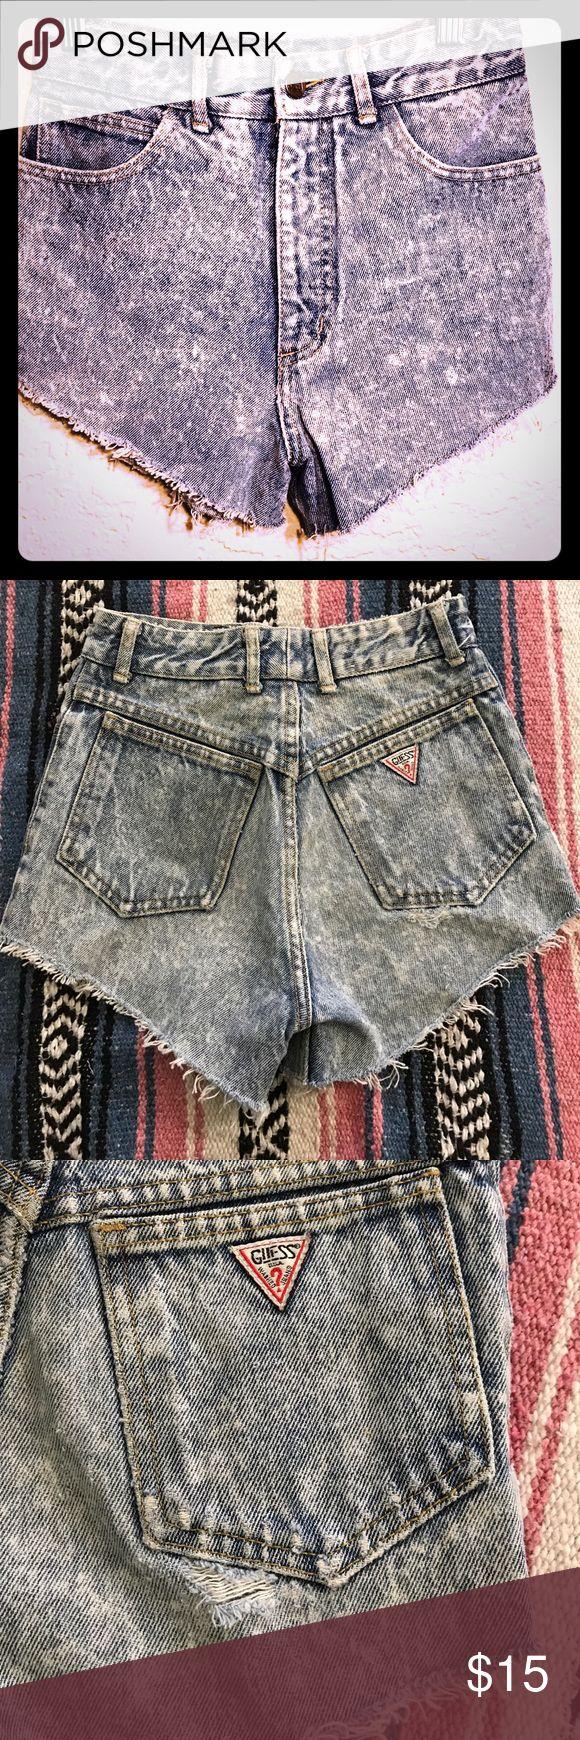 Guess Marciano denim shorts Vintage guess, acid wash, cut off shorts. Classic triangle logo. Guess Shorts Jean Shorts